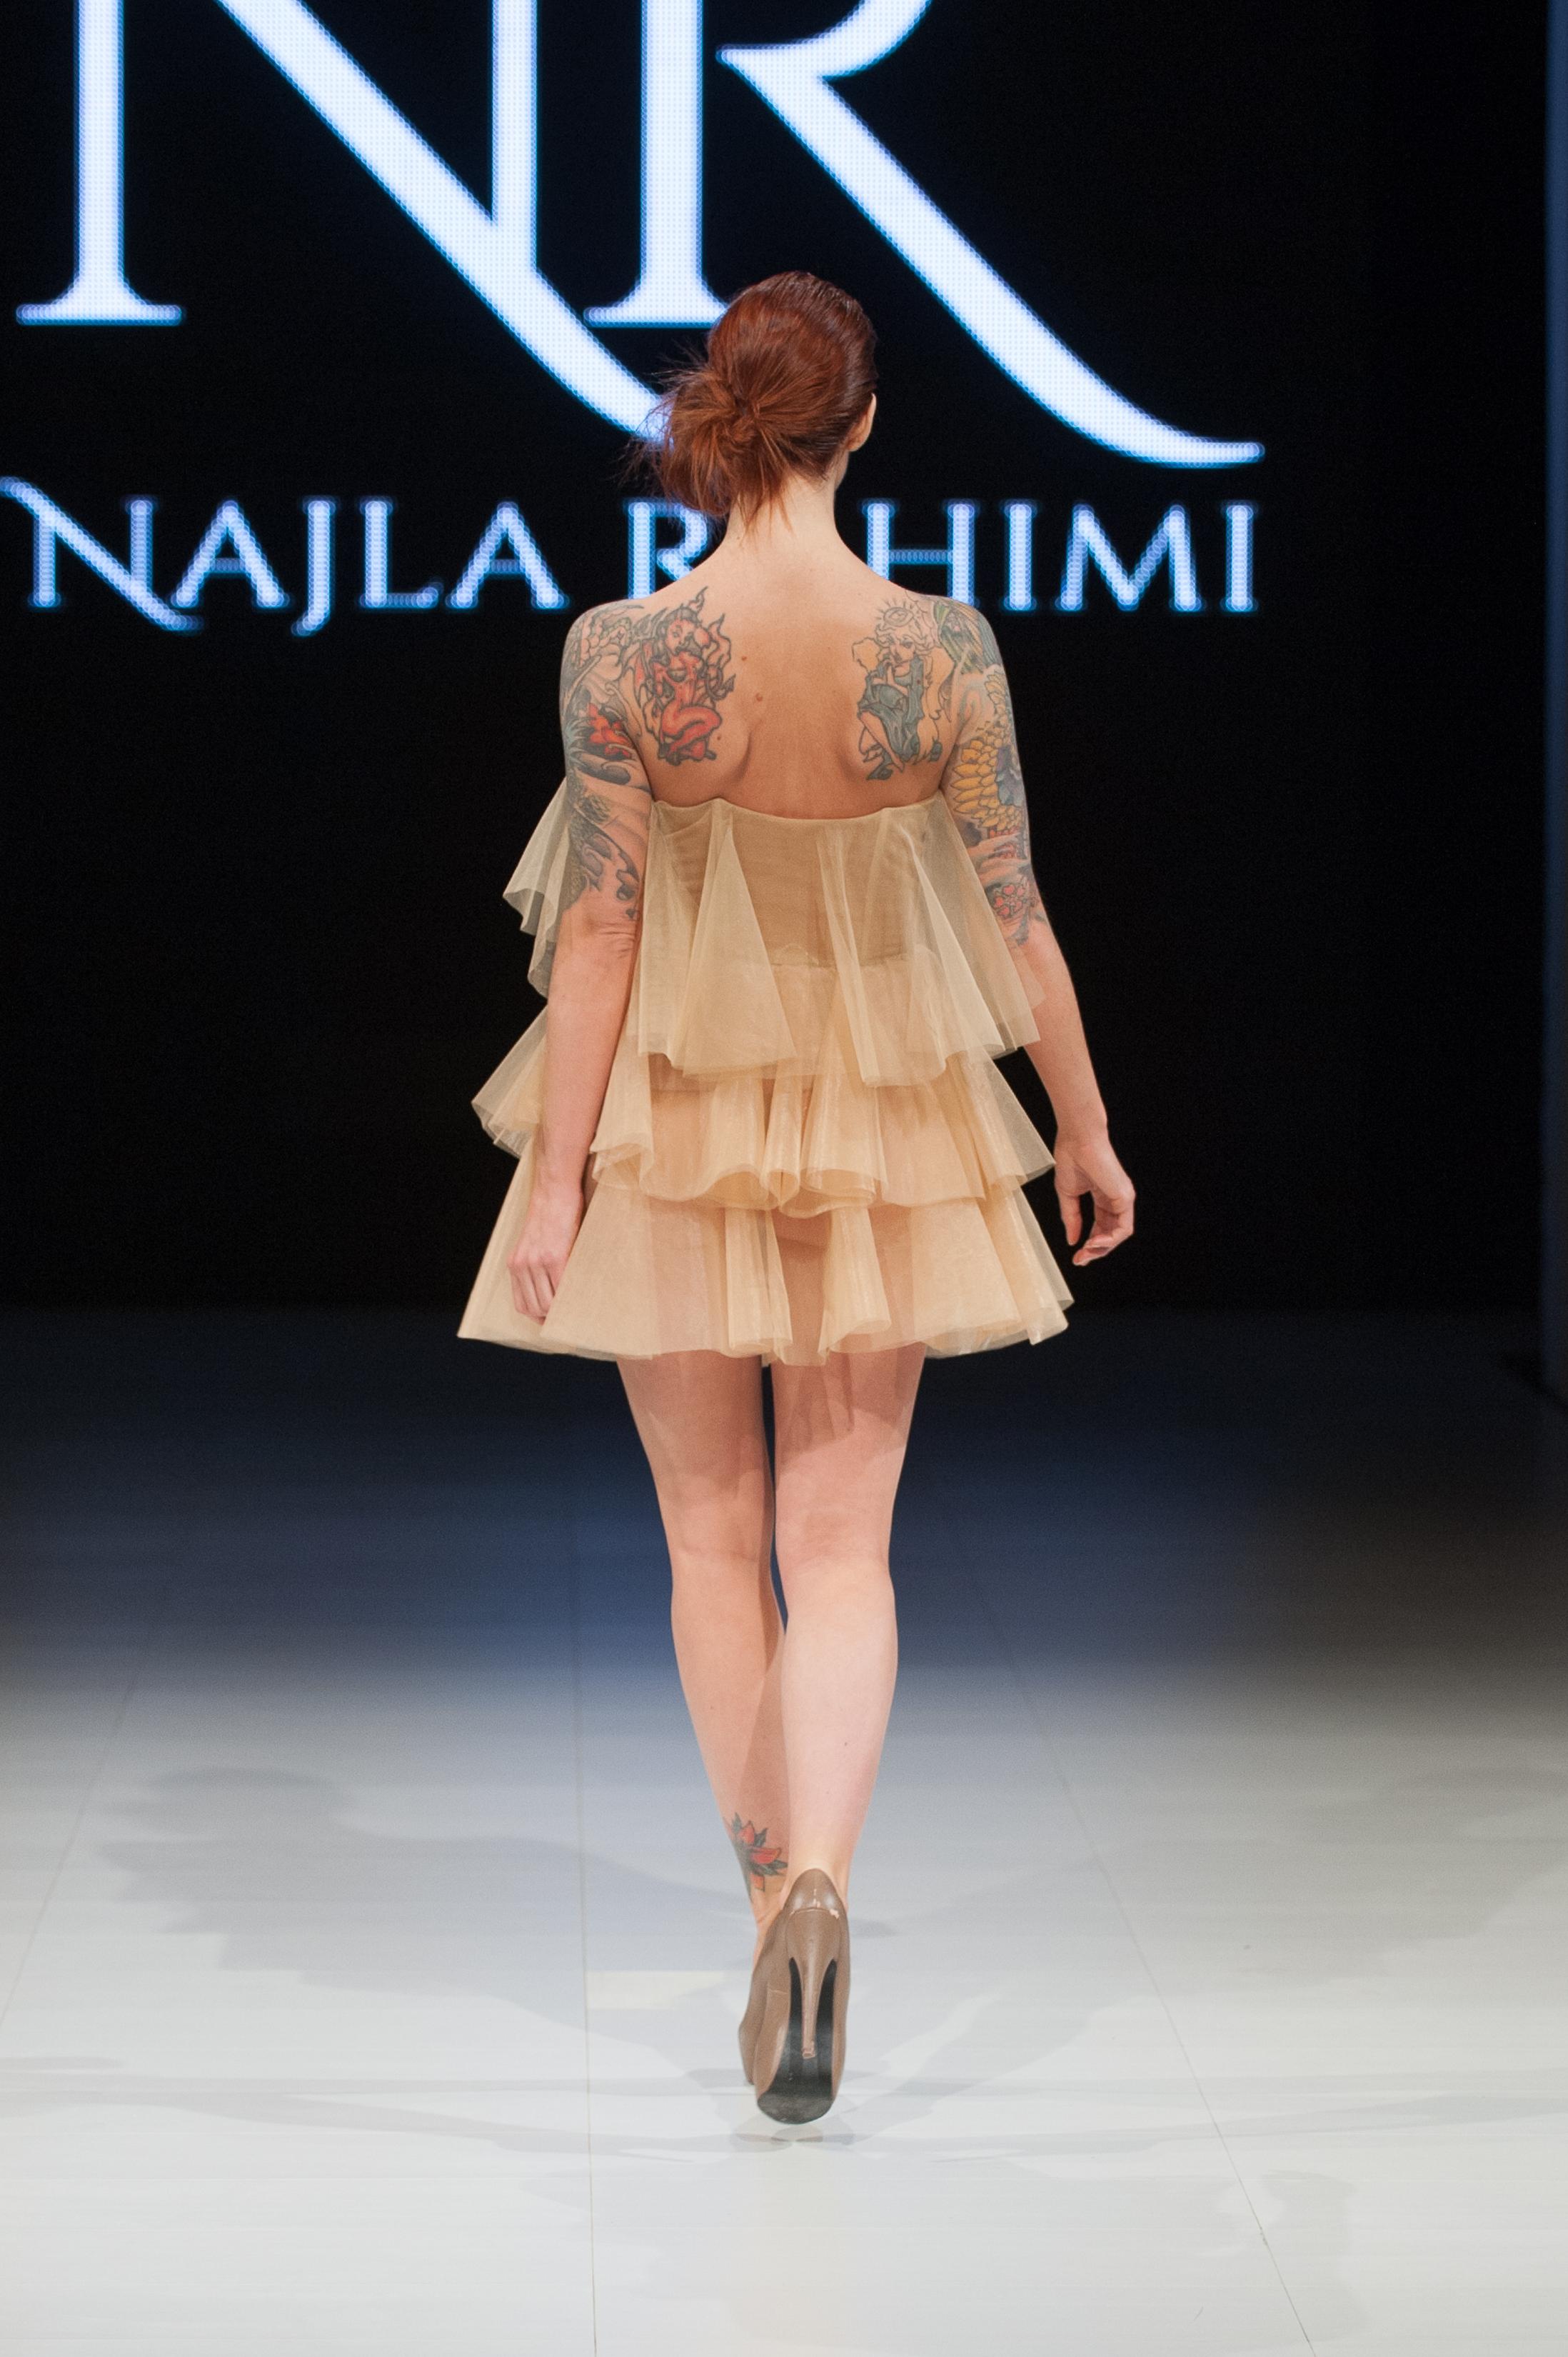 FAT2018-Day1-April17-Najla_Rahimi-Runway-Che_Rosales-LARAWAN-6025.jpg